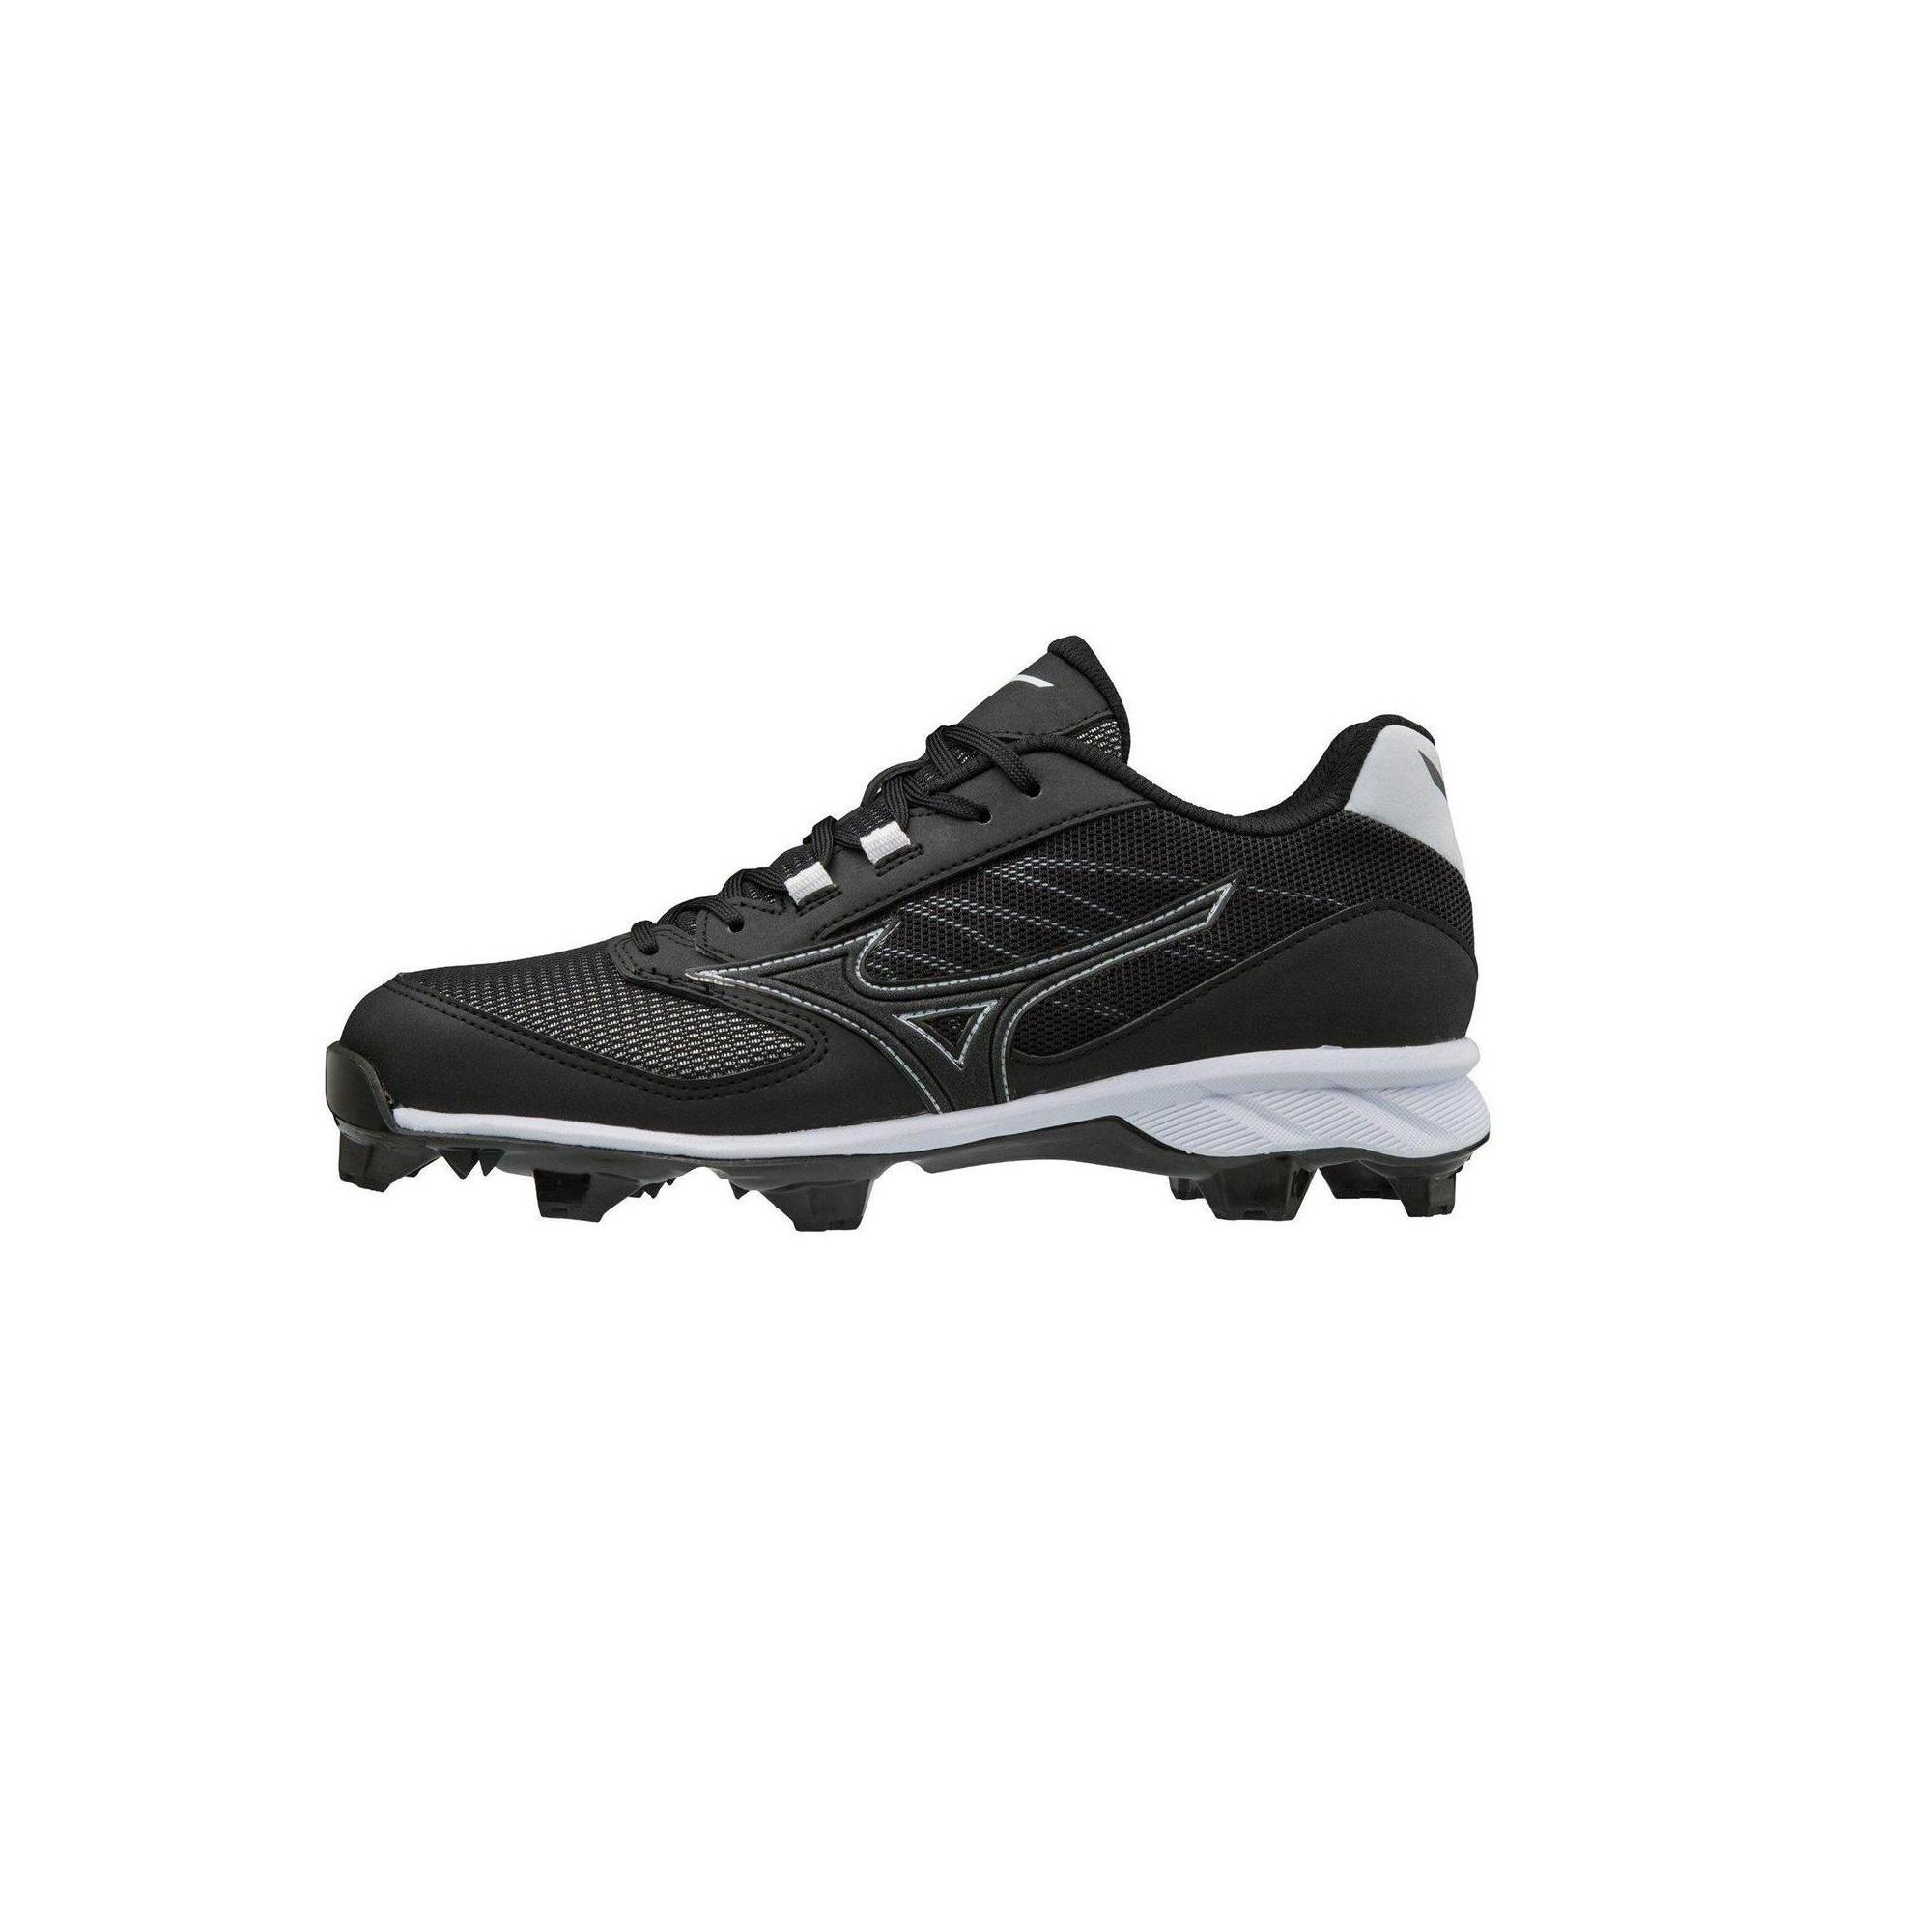 2accbc0a6 Mizuno Mens Baseball Shoes - 9-Spike Advanced Dominant Tpu Mens Molded Baseball  Cleat - 320566 Size 8 Black-White (9000)